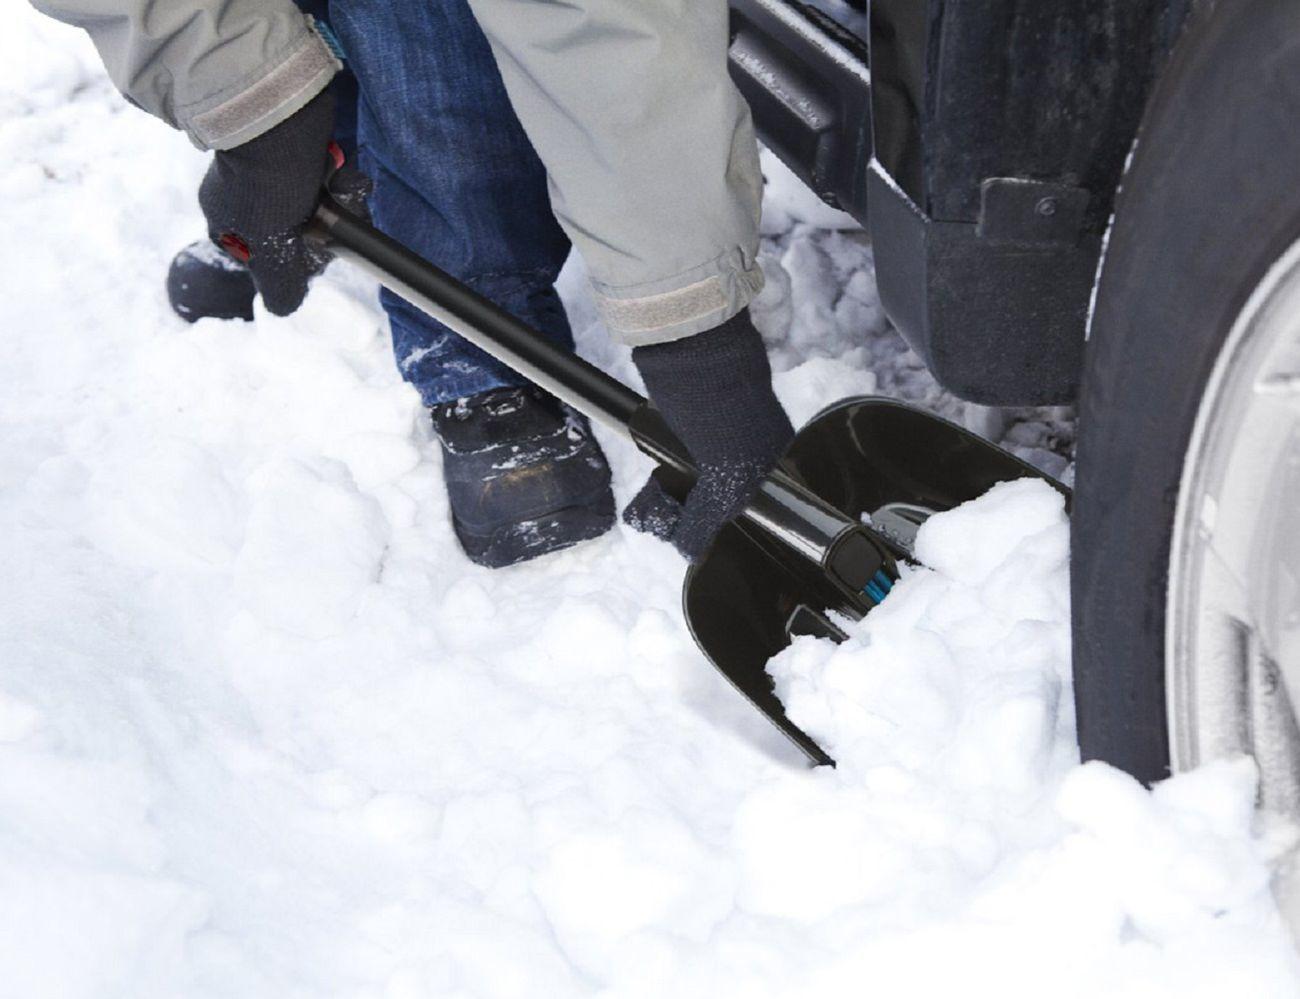 Zeus Snow Shovel and Brush